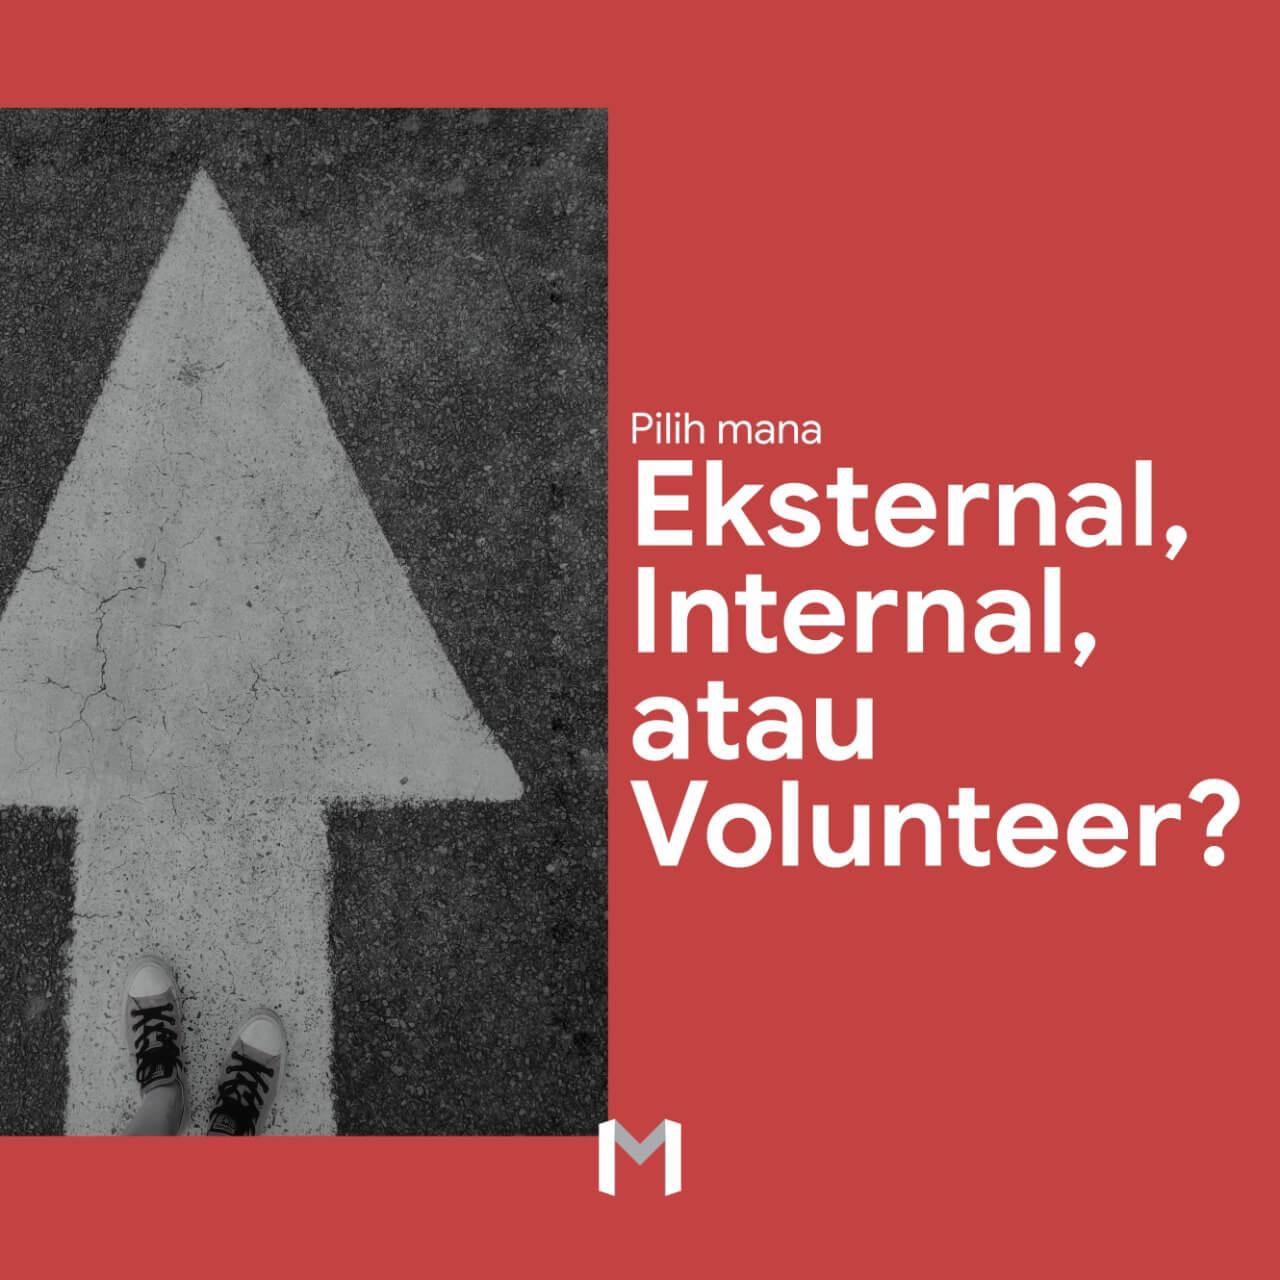 Pilih Mana: Organisasi Eksternal, Organisasi Internal, atau Volunteer?